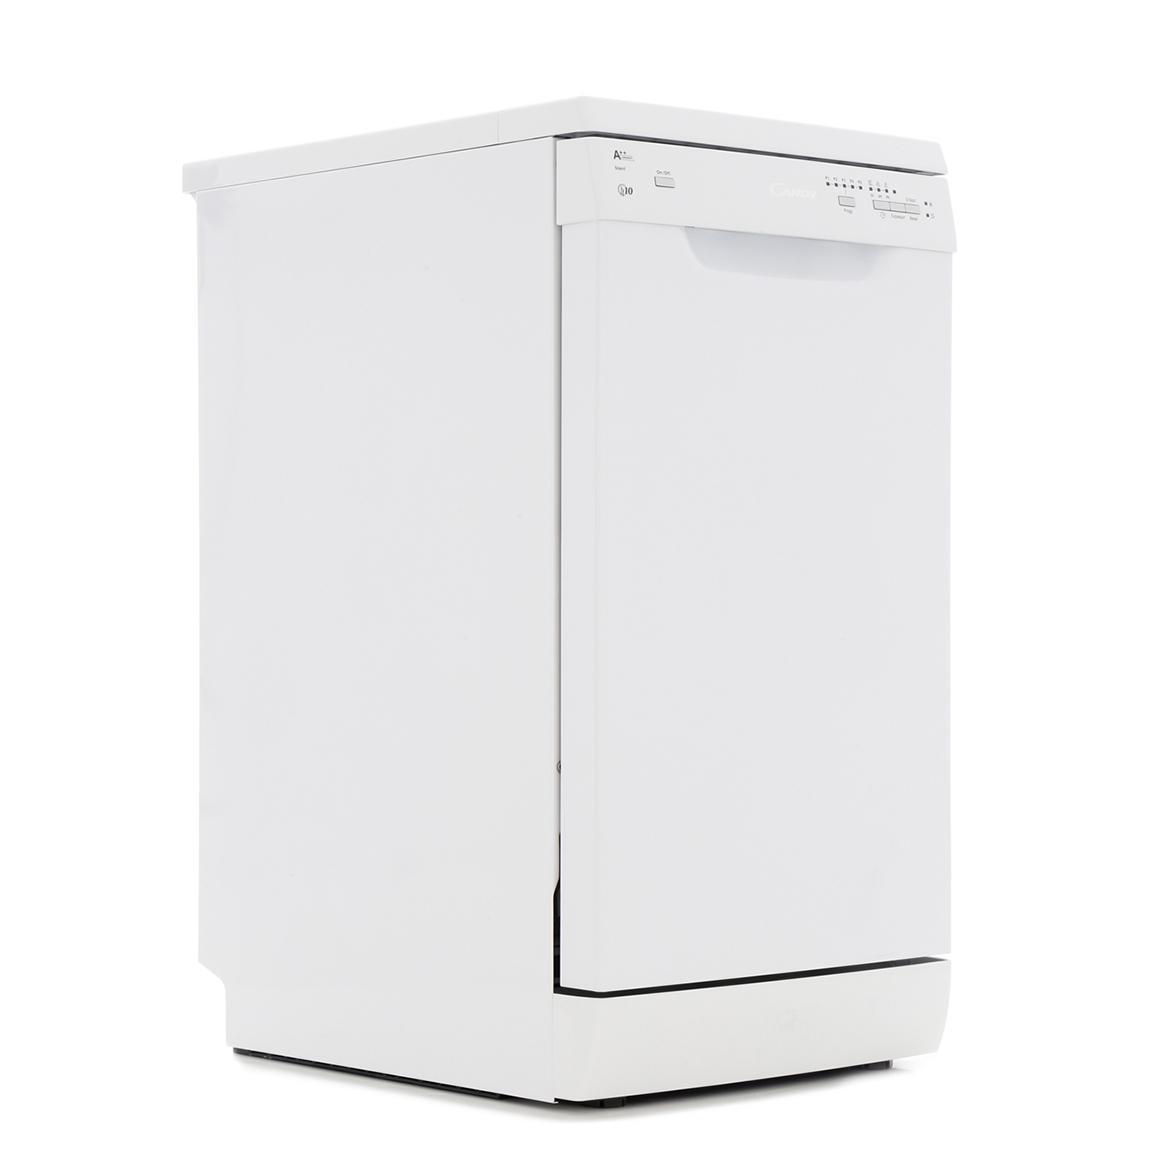 Candy CDP2L1049W Slimline Dishwasher